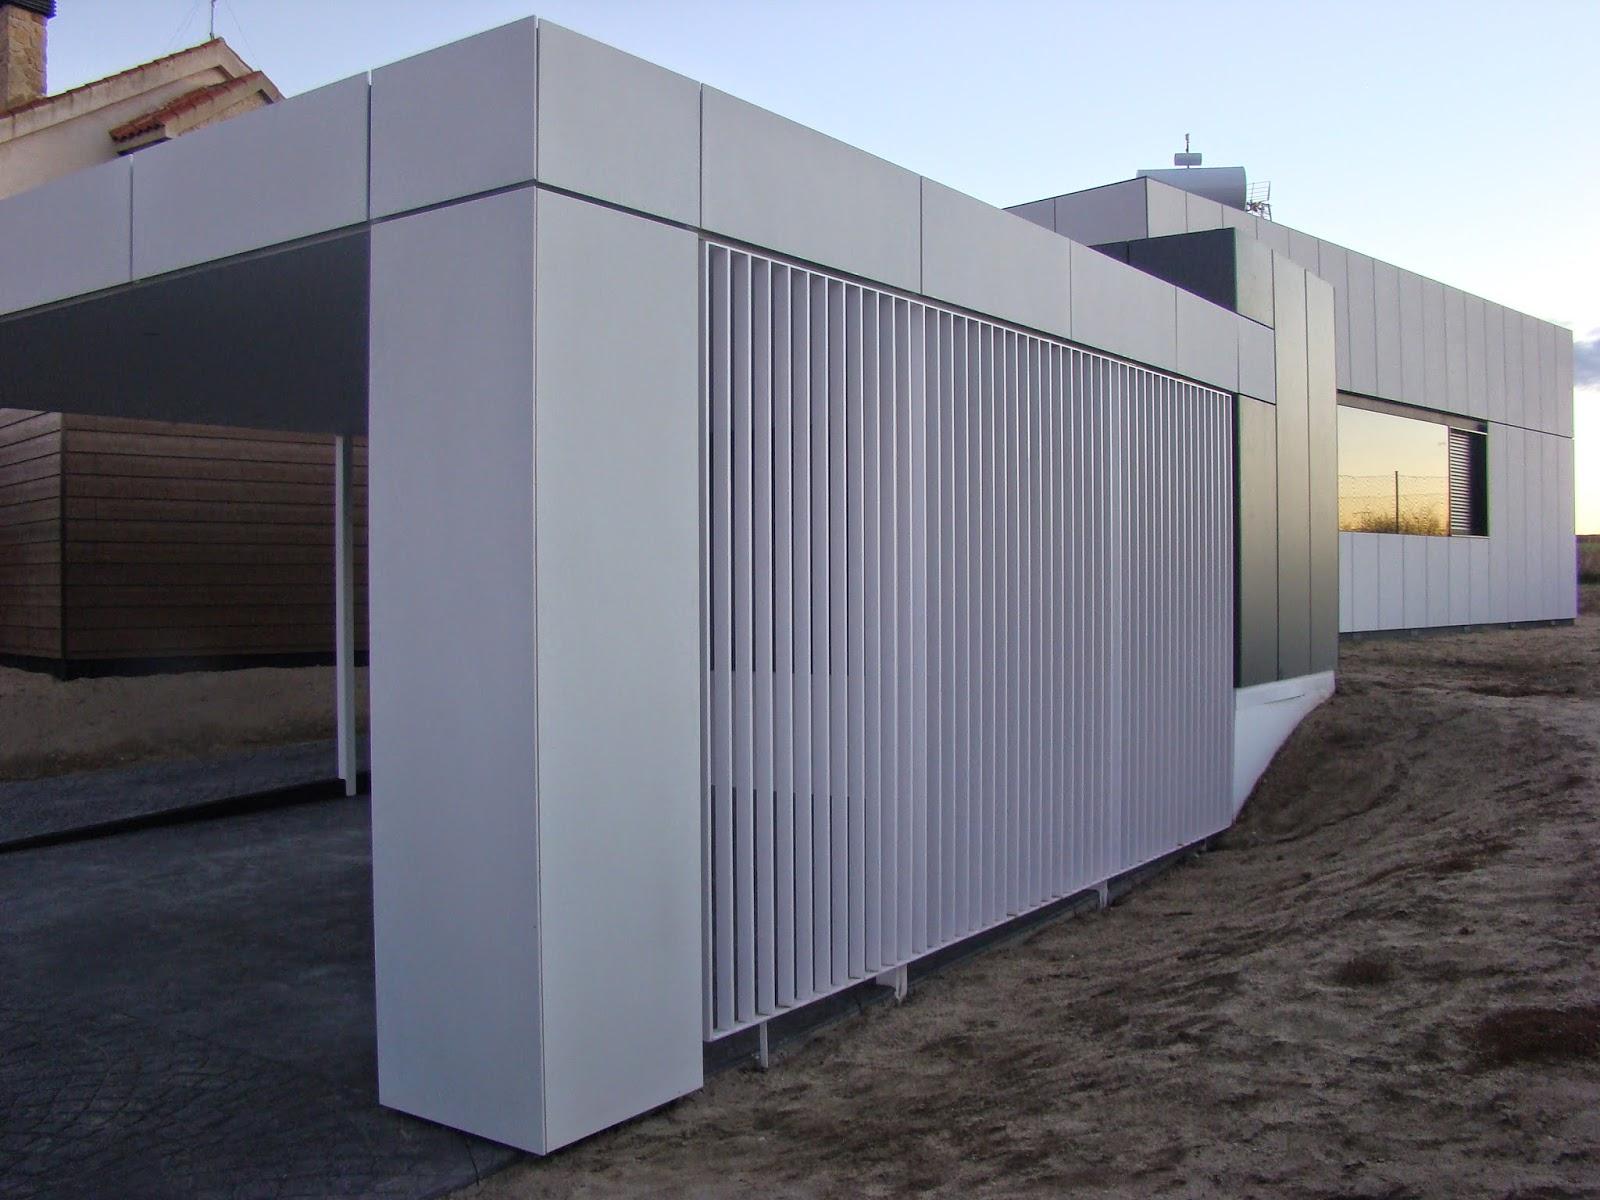 Garaje modular abierto de Resan, vista lateral